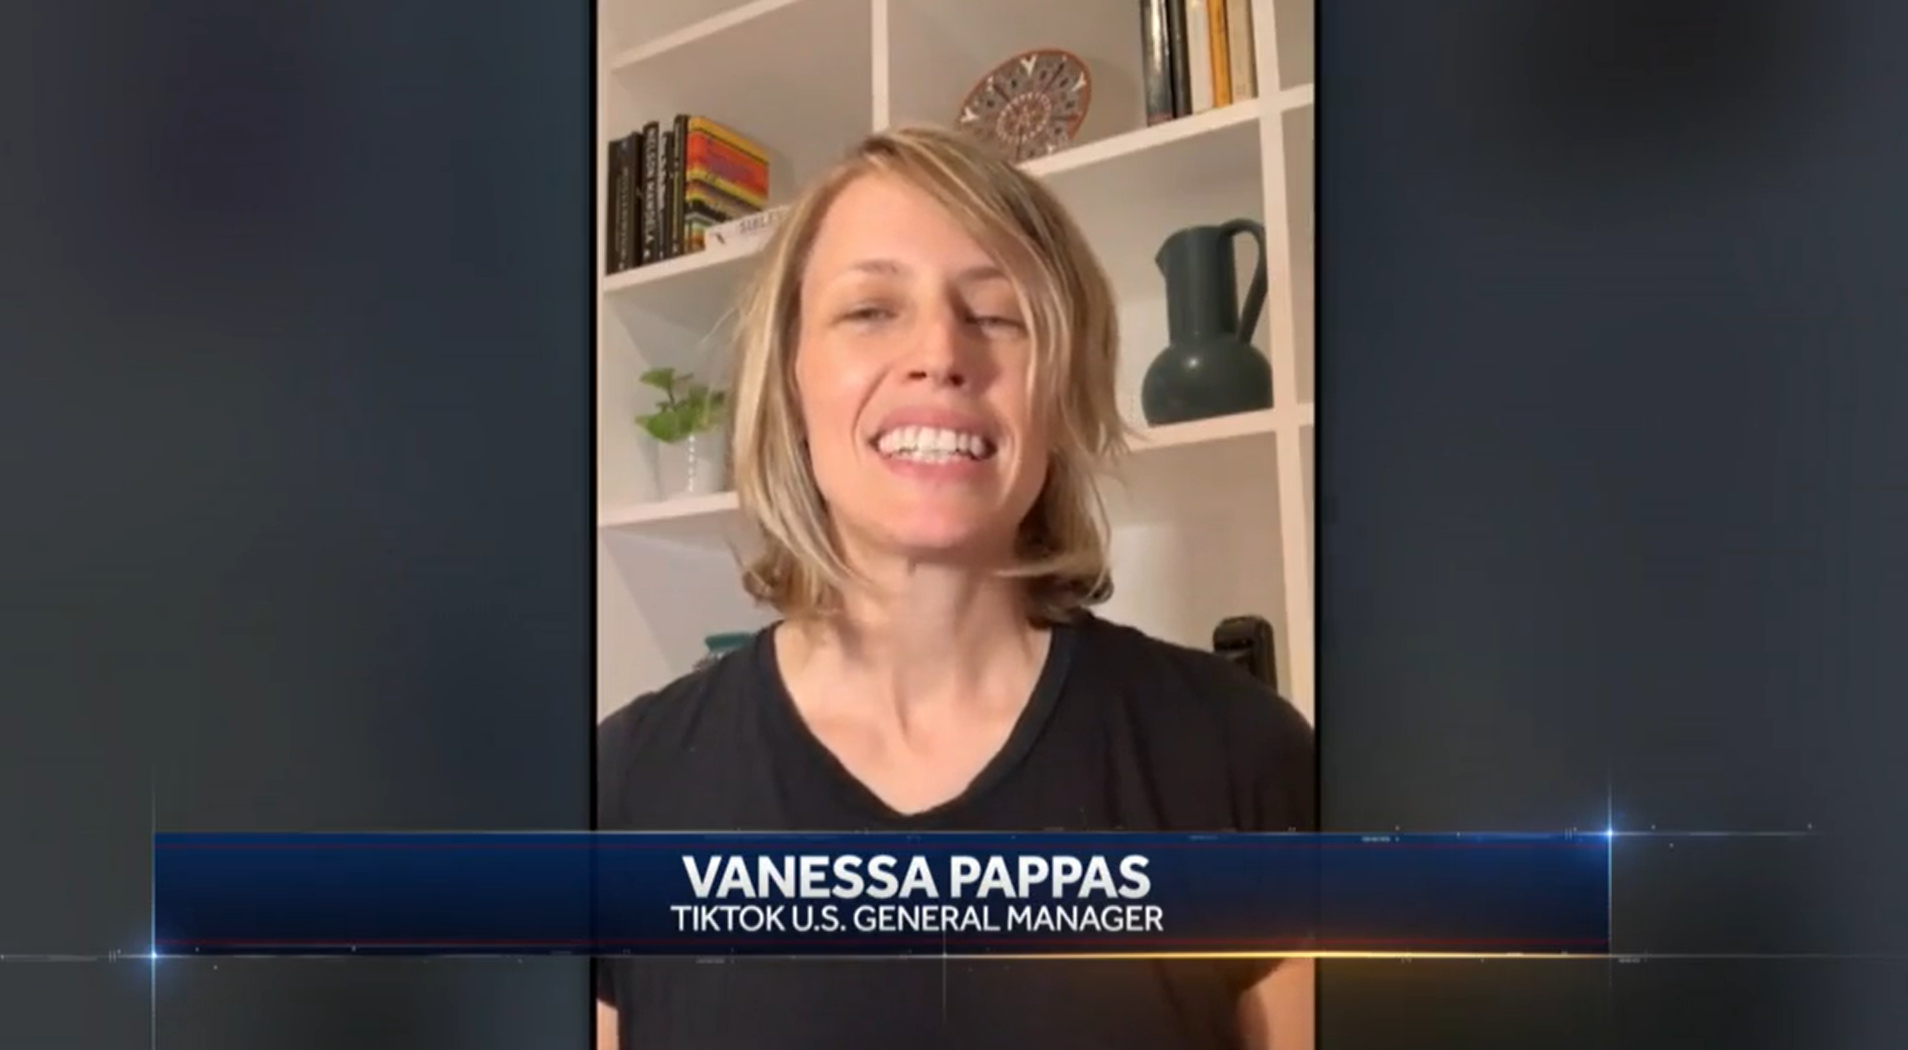 TikTok美国总经理瓦妮莎·帕帕斯